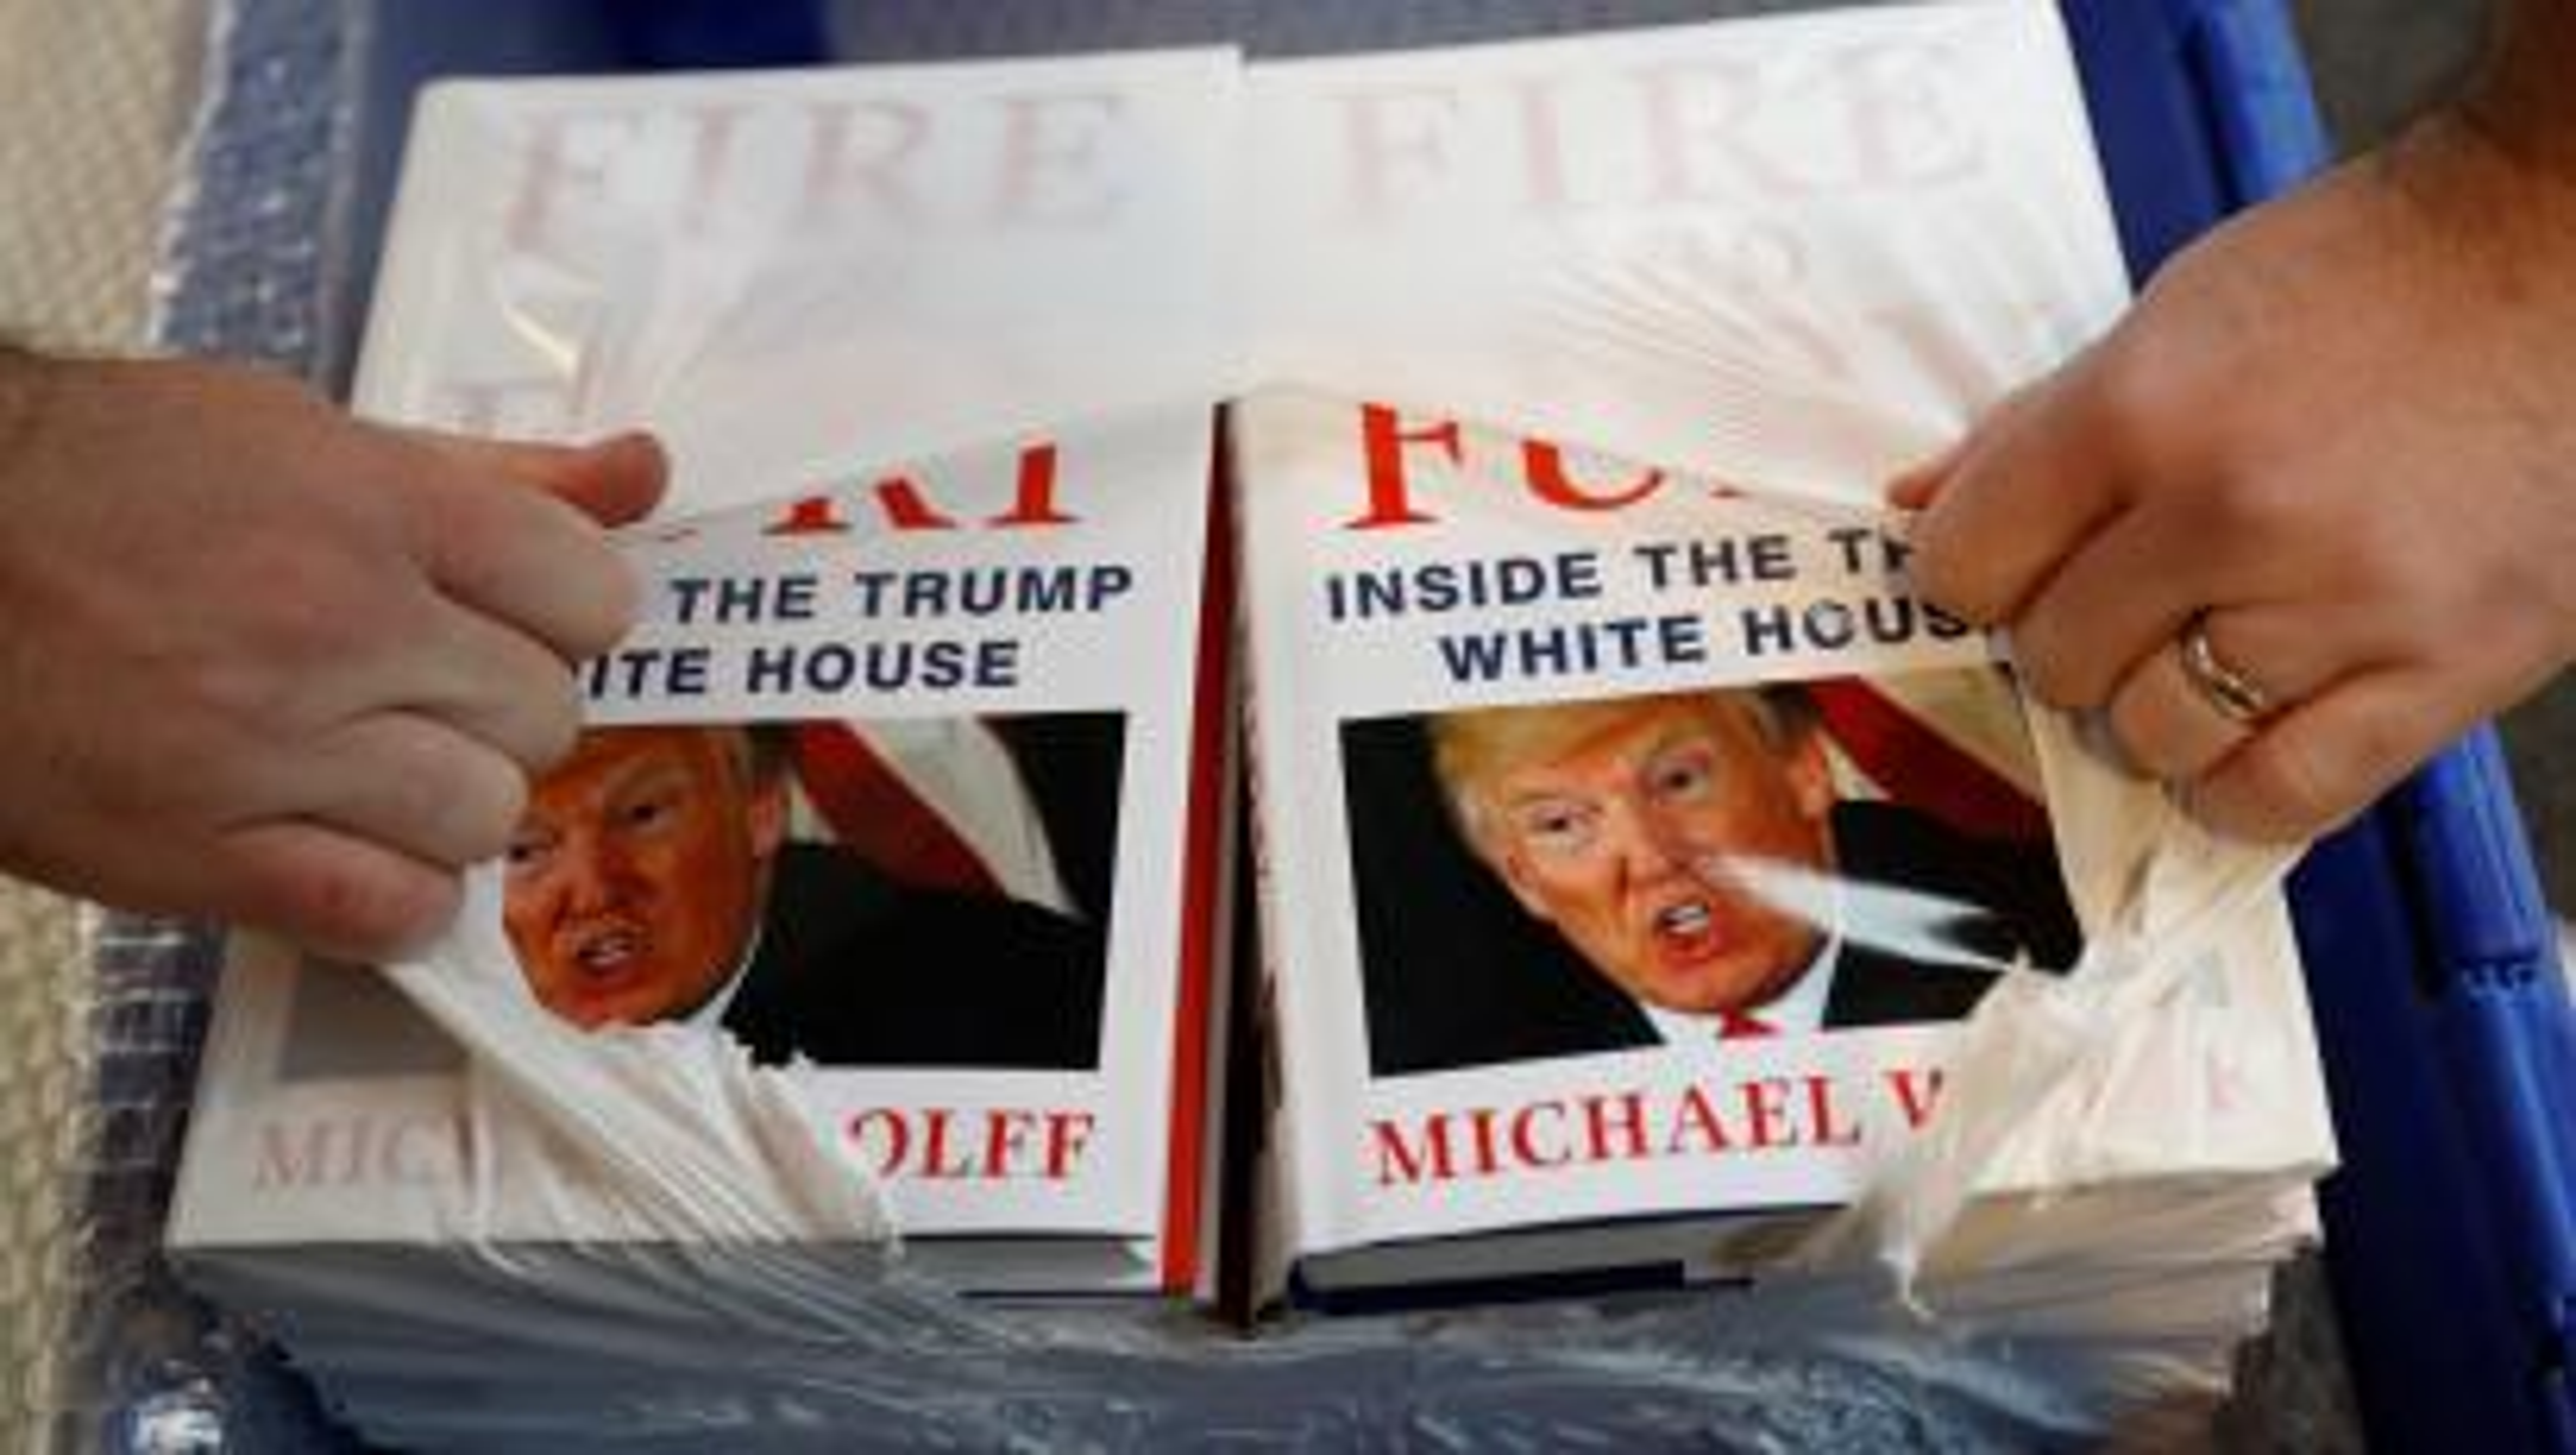 Fire and Fury Michael Wolff politics books